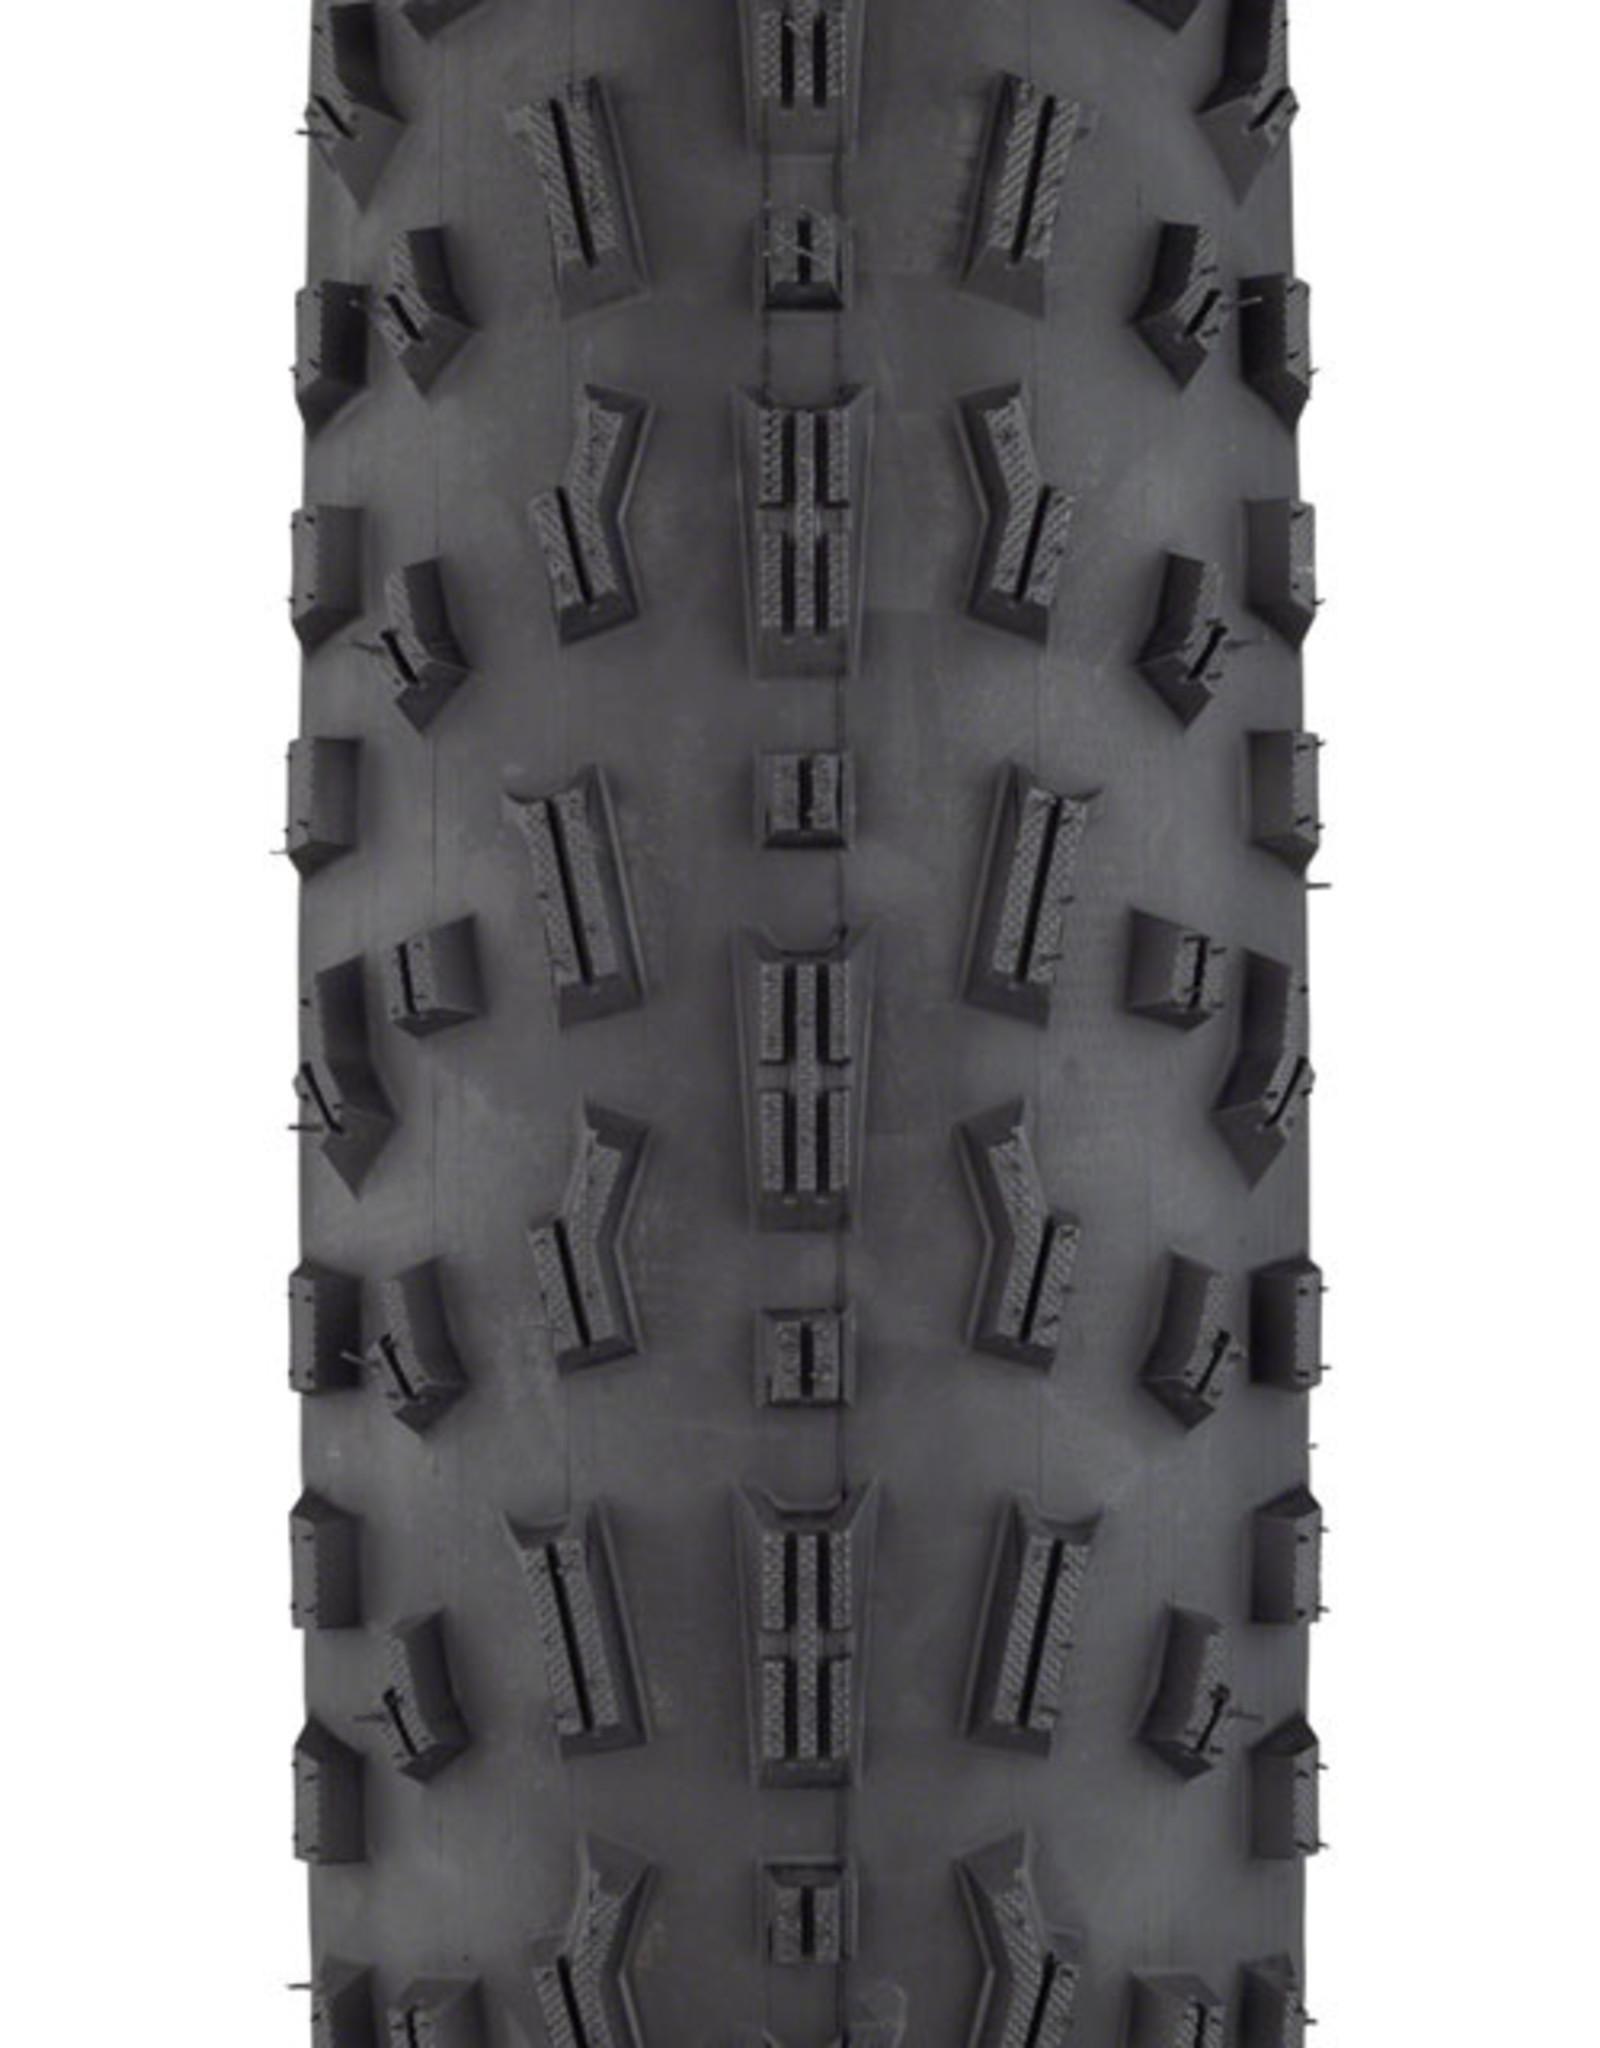 Surly Surly Bud Tire - 26 x 4.8, Tubeless, Folding, Black, 120tpi